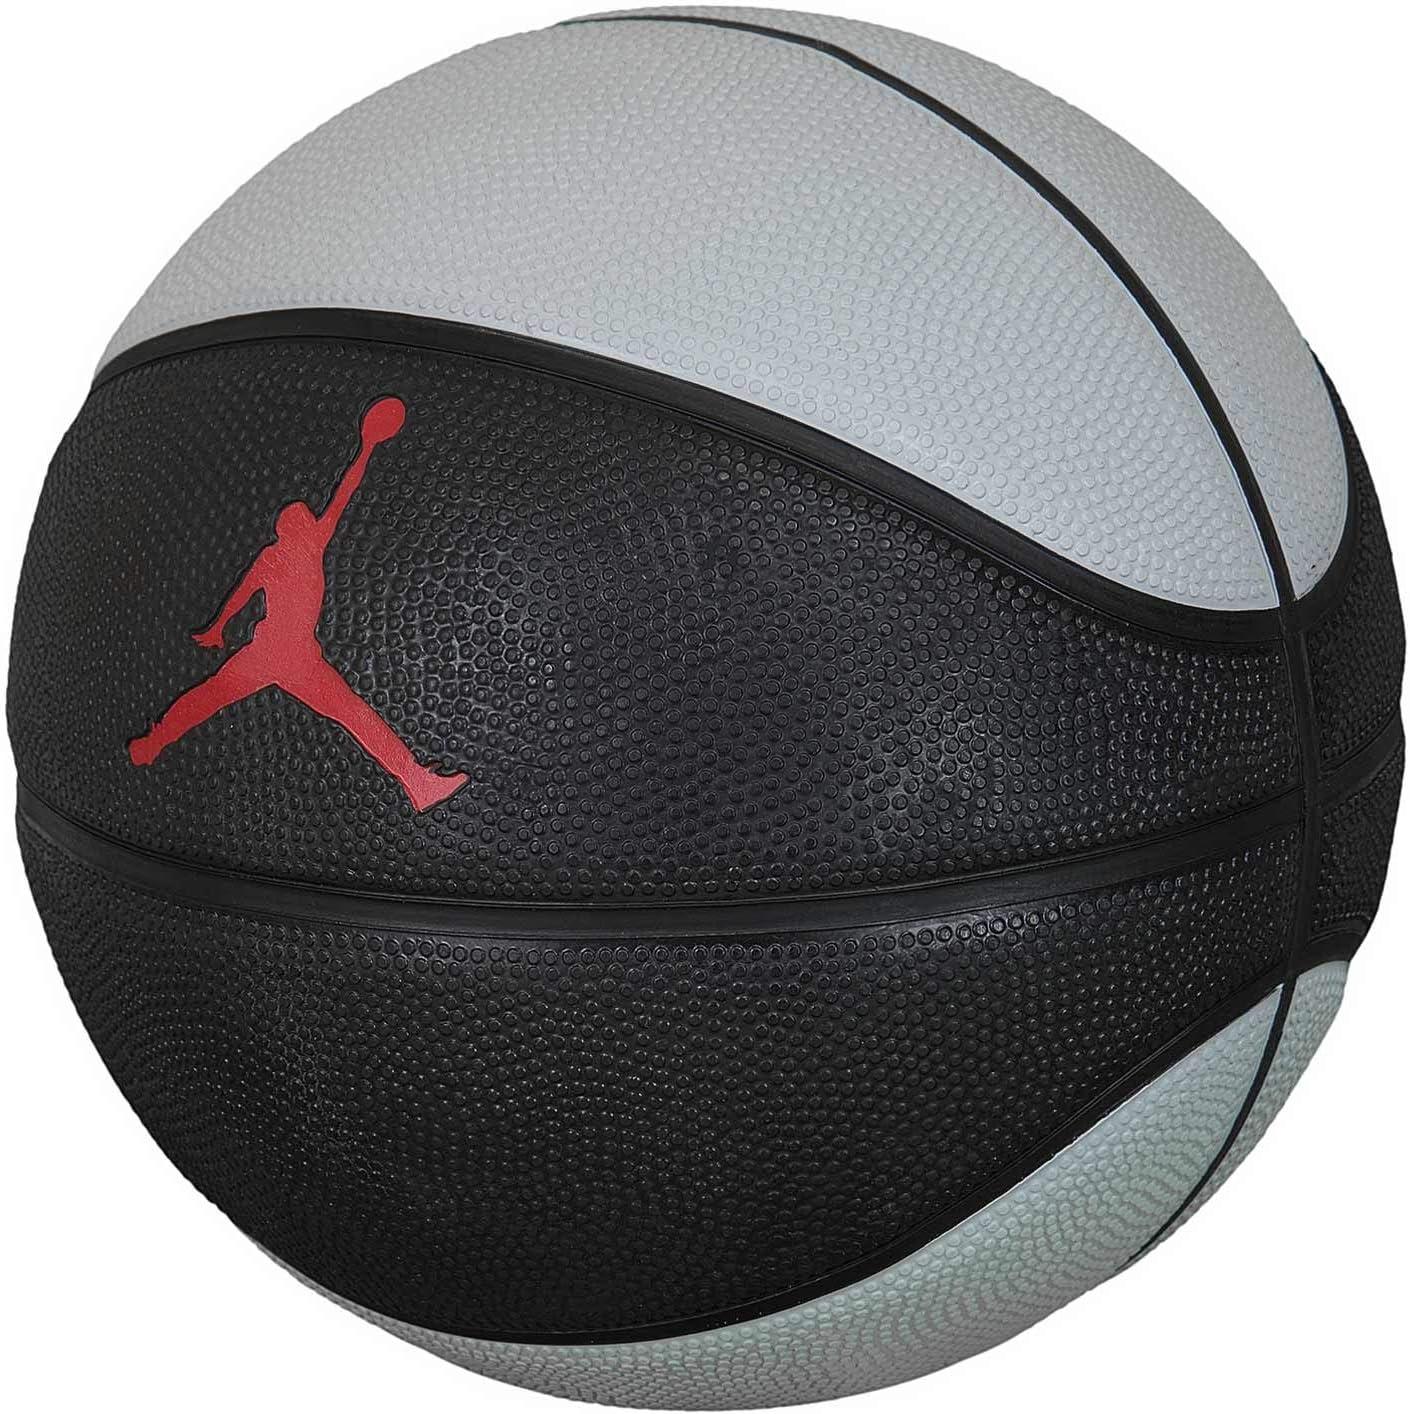 recibo pala exégesis  Nike Jordan Skills Mini Basketball (3, Black/Grey/Red): Amazon.co.uk:  Sports & Outdoors